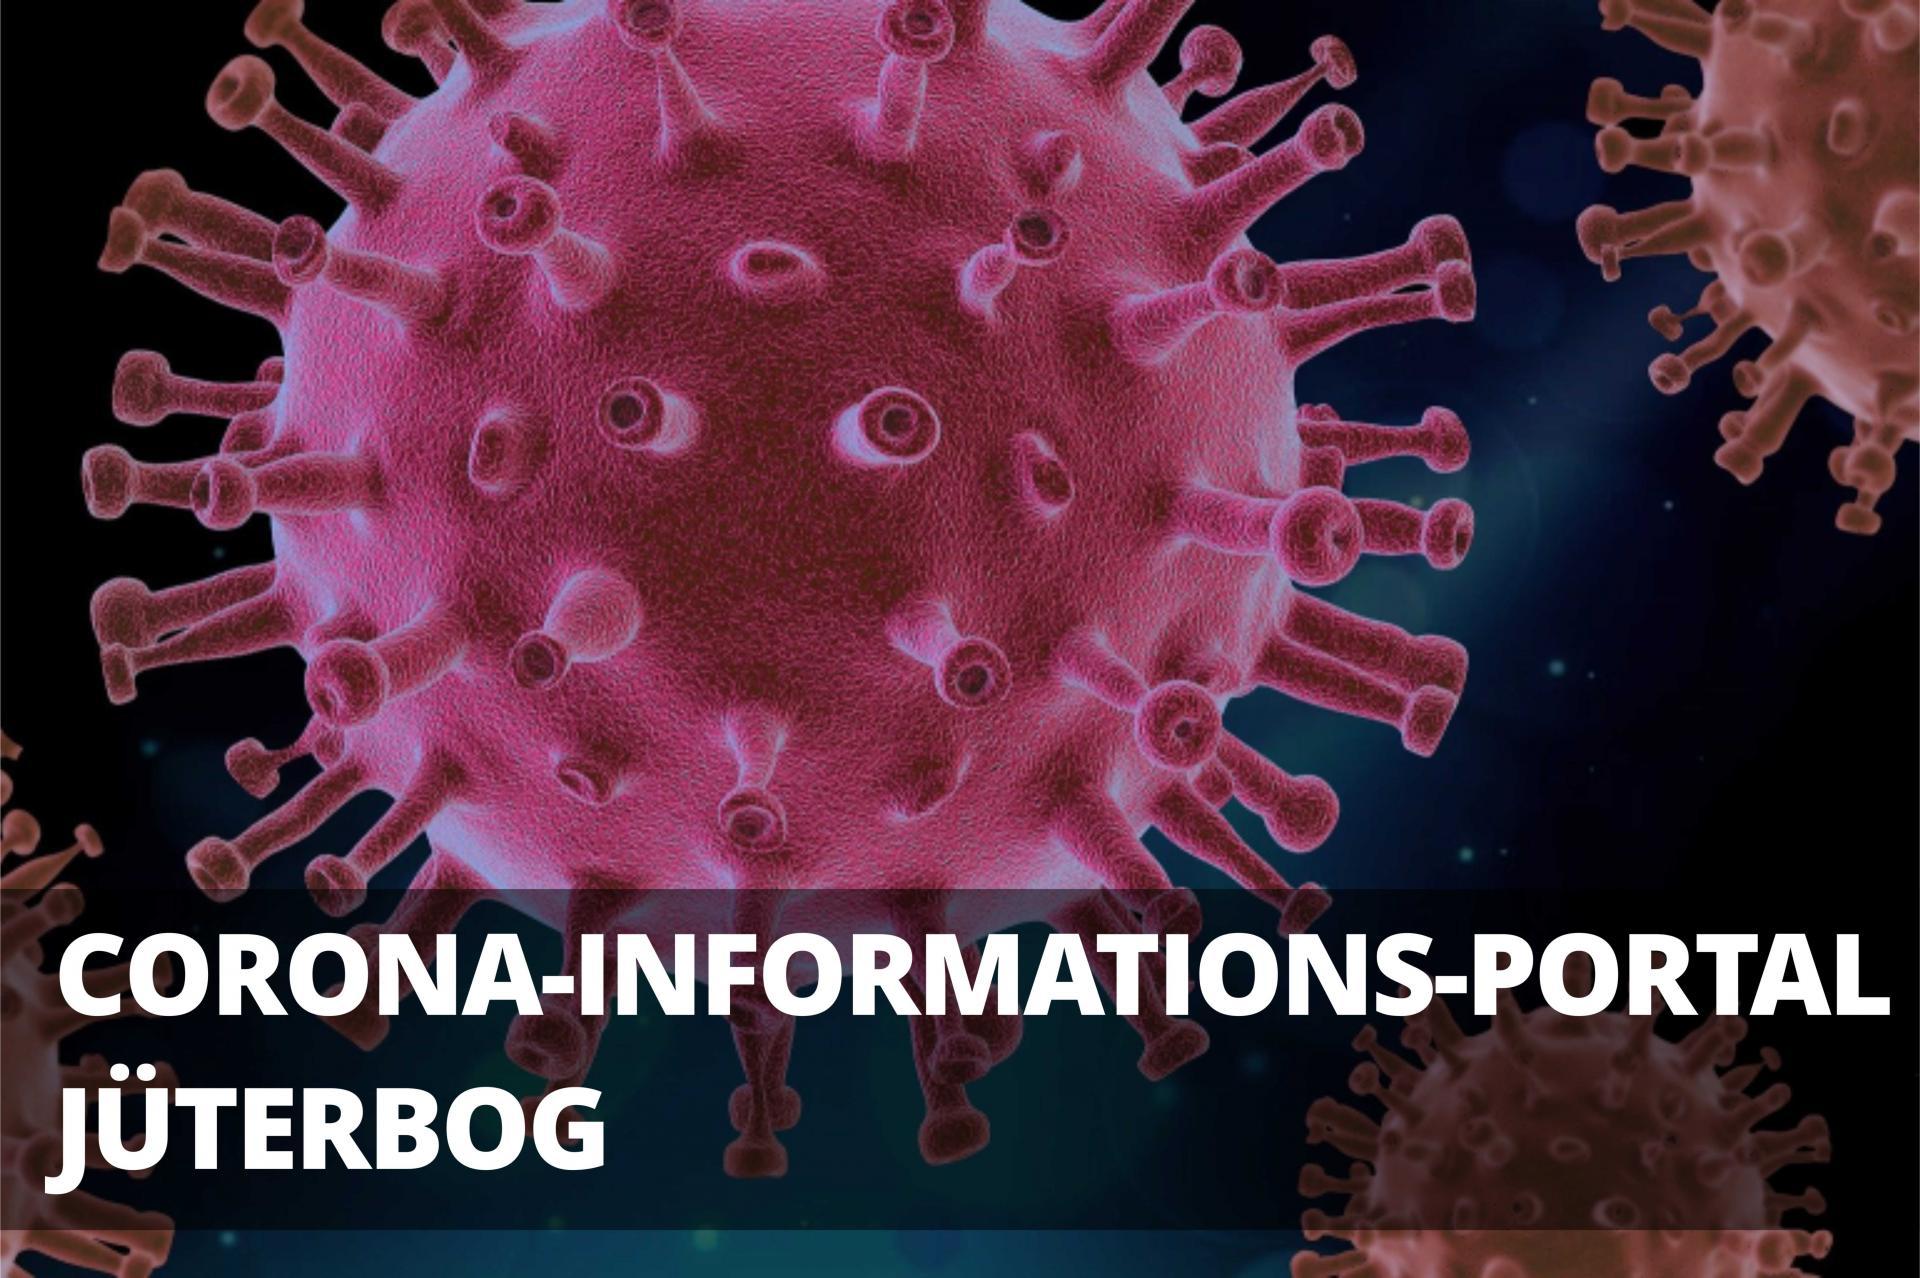 Corona-Informations-Portal Jüterbog